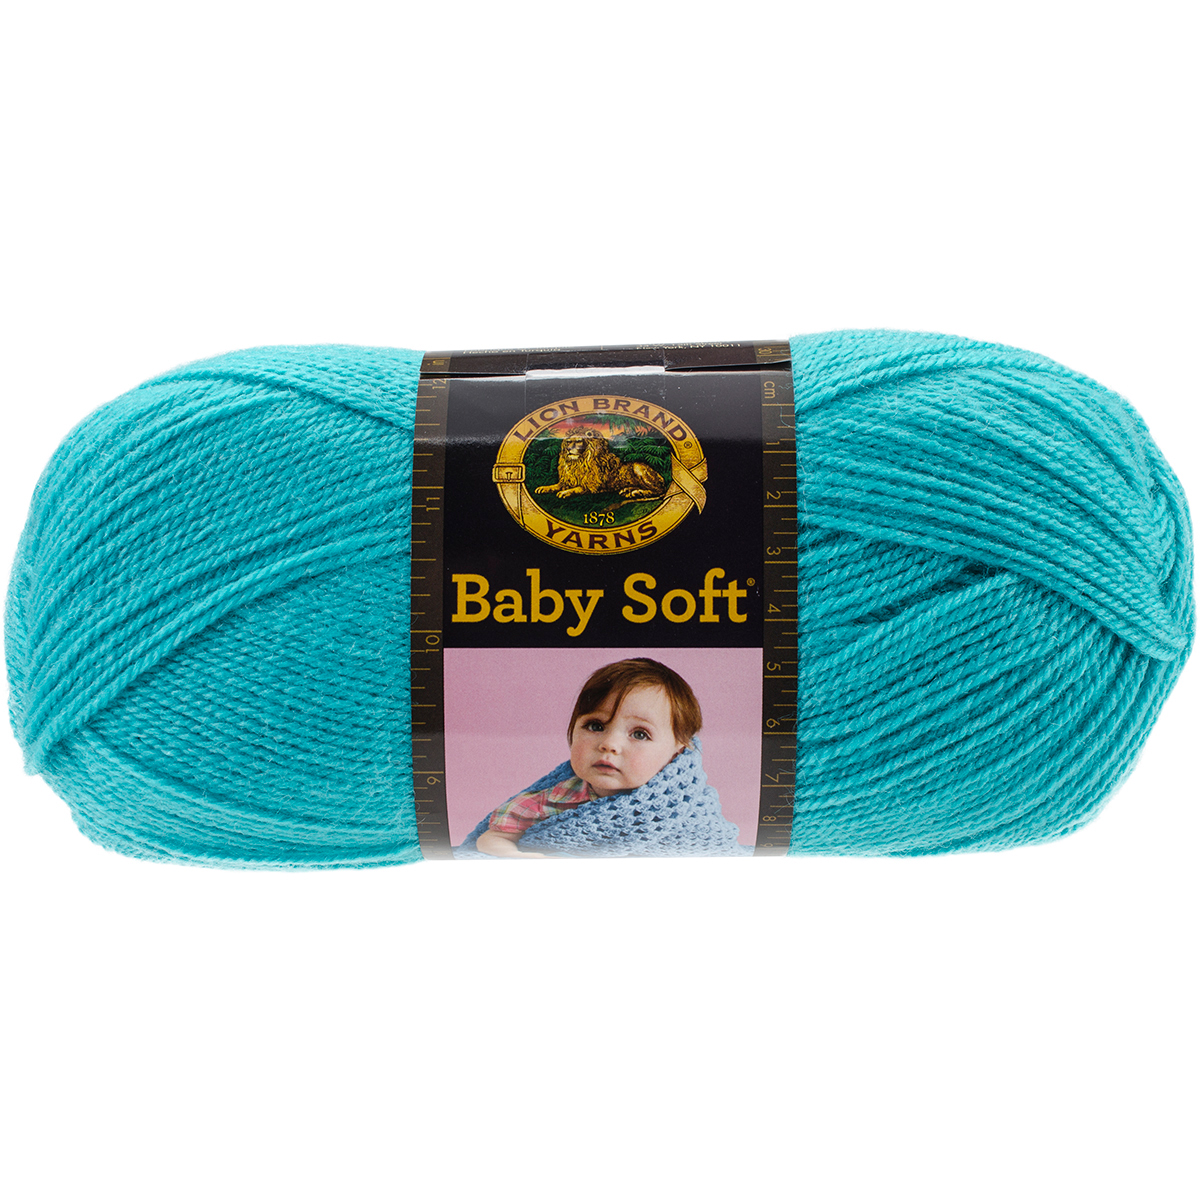 Lion Brand Yarn 920-178 Teal Babysoft Yarn Multicolor